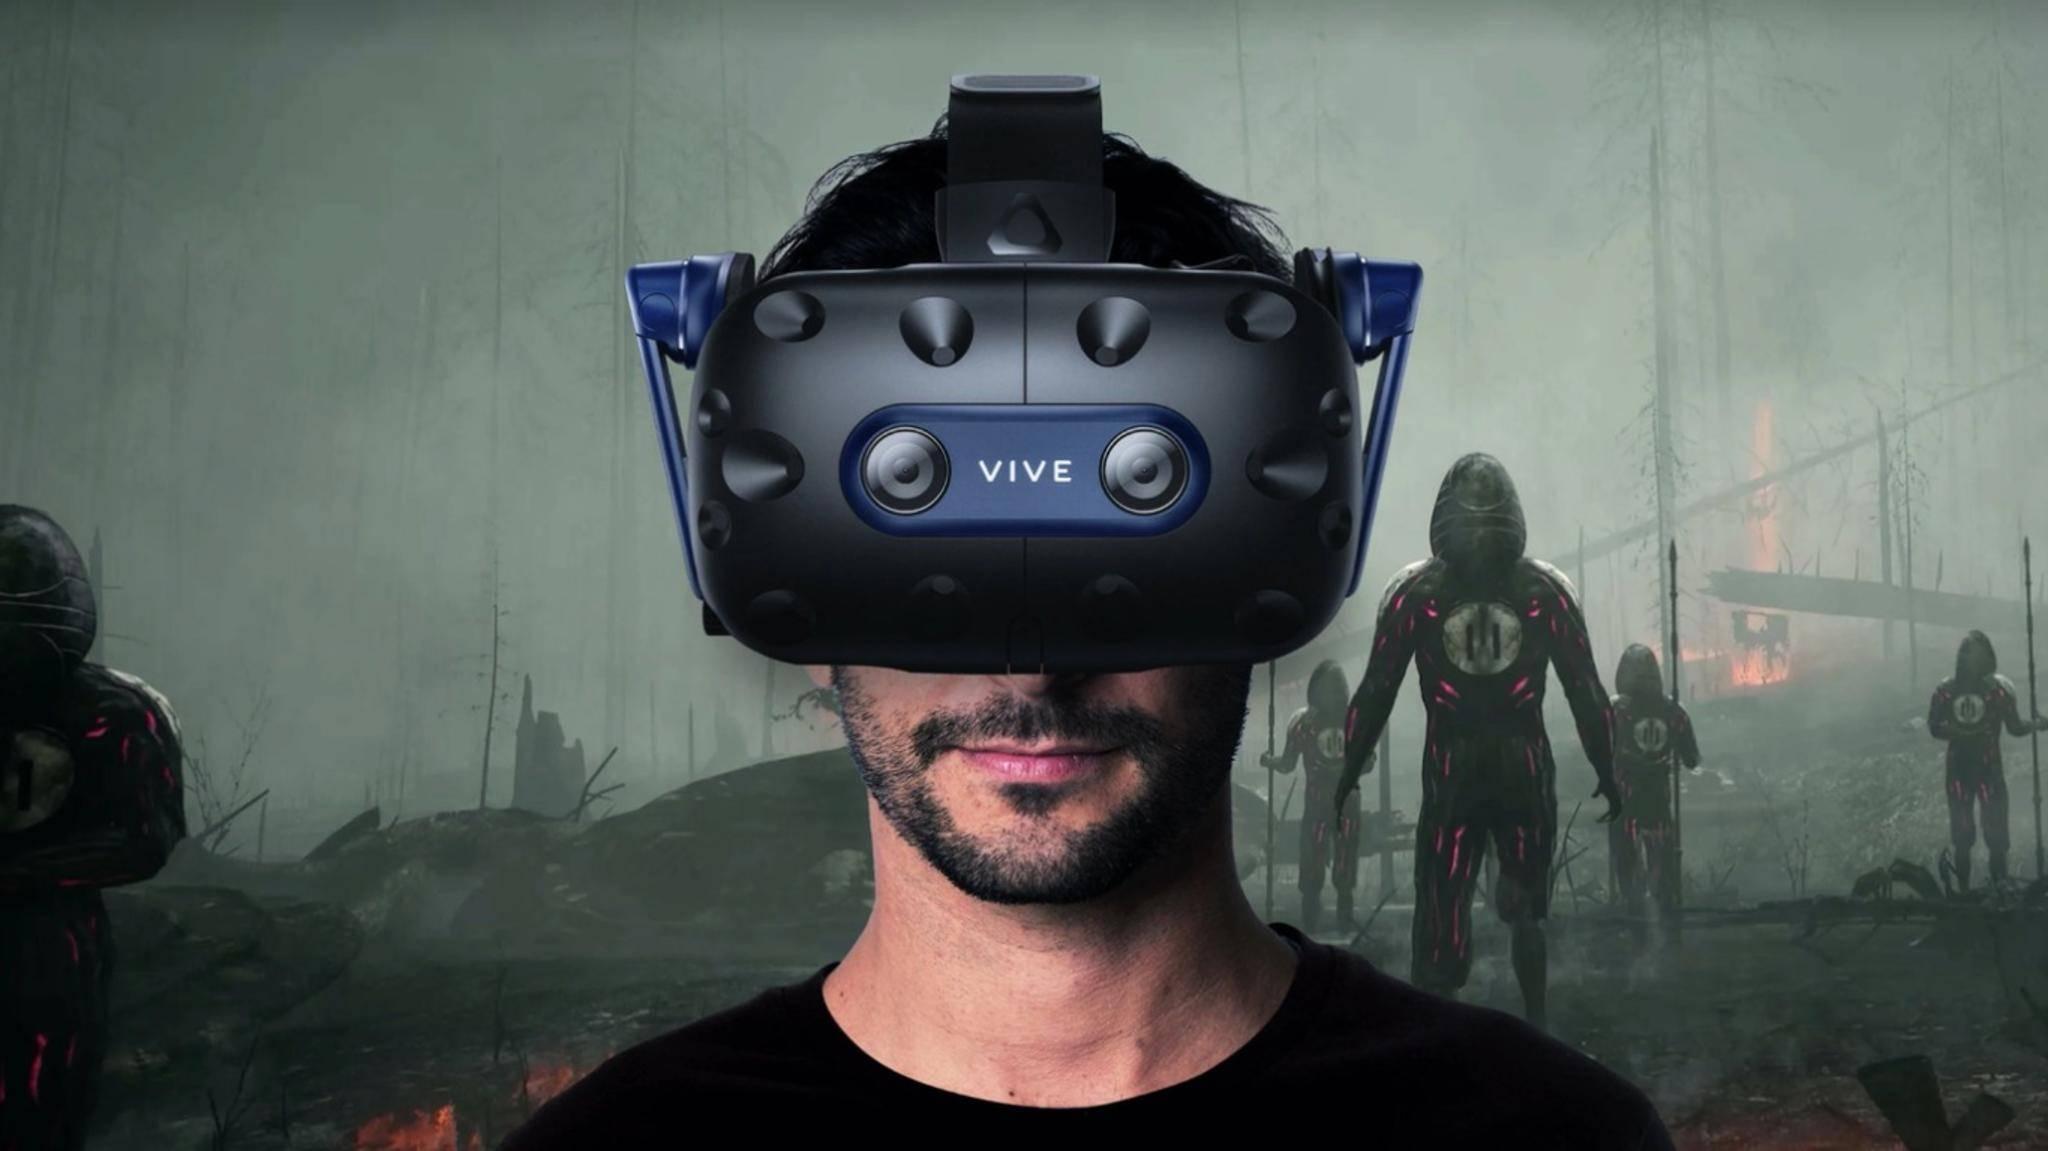 htc-vive-pro-2-vr-headset